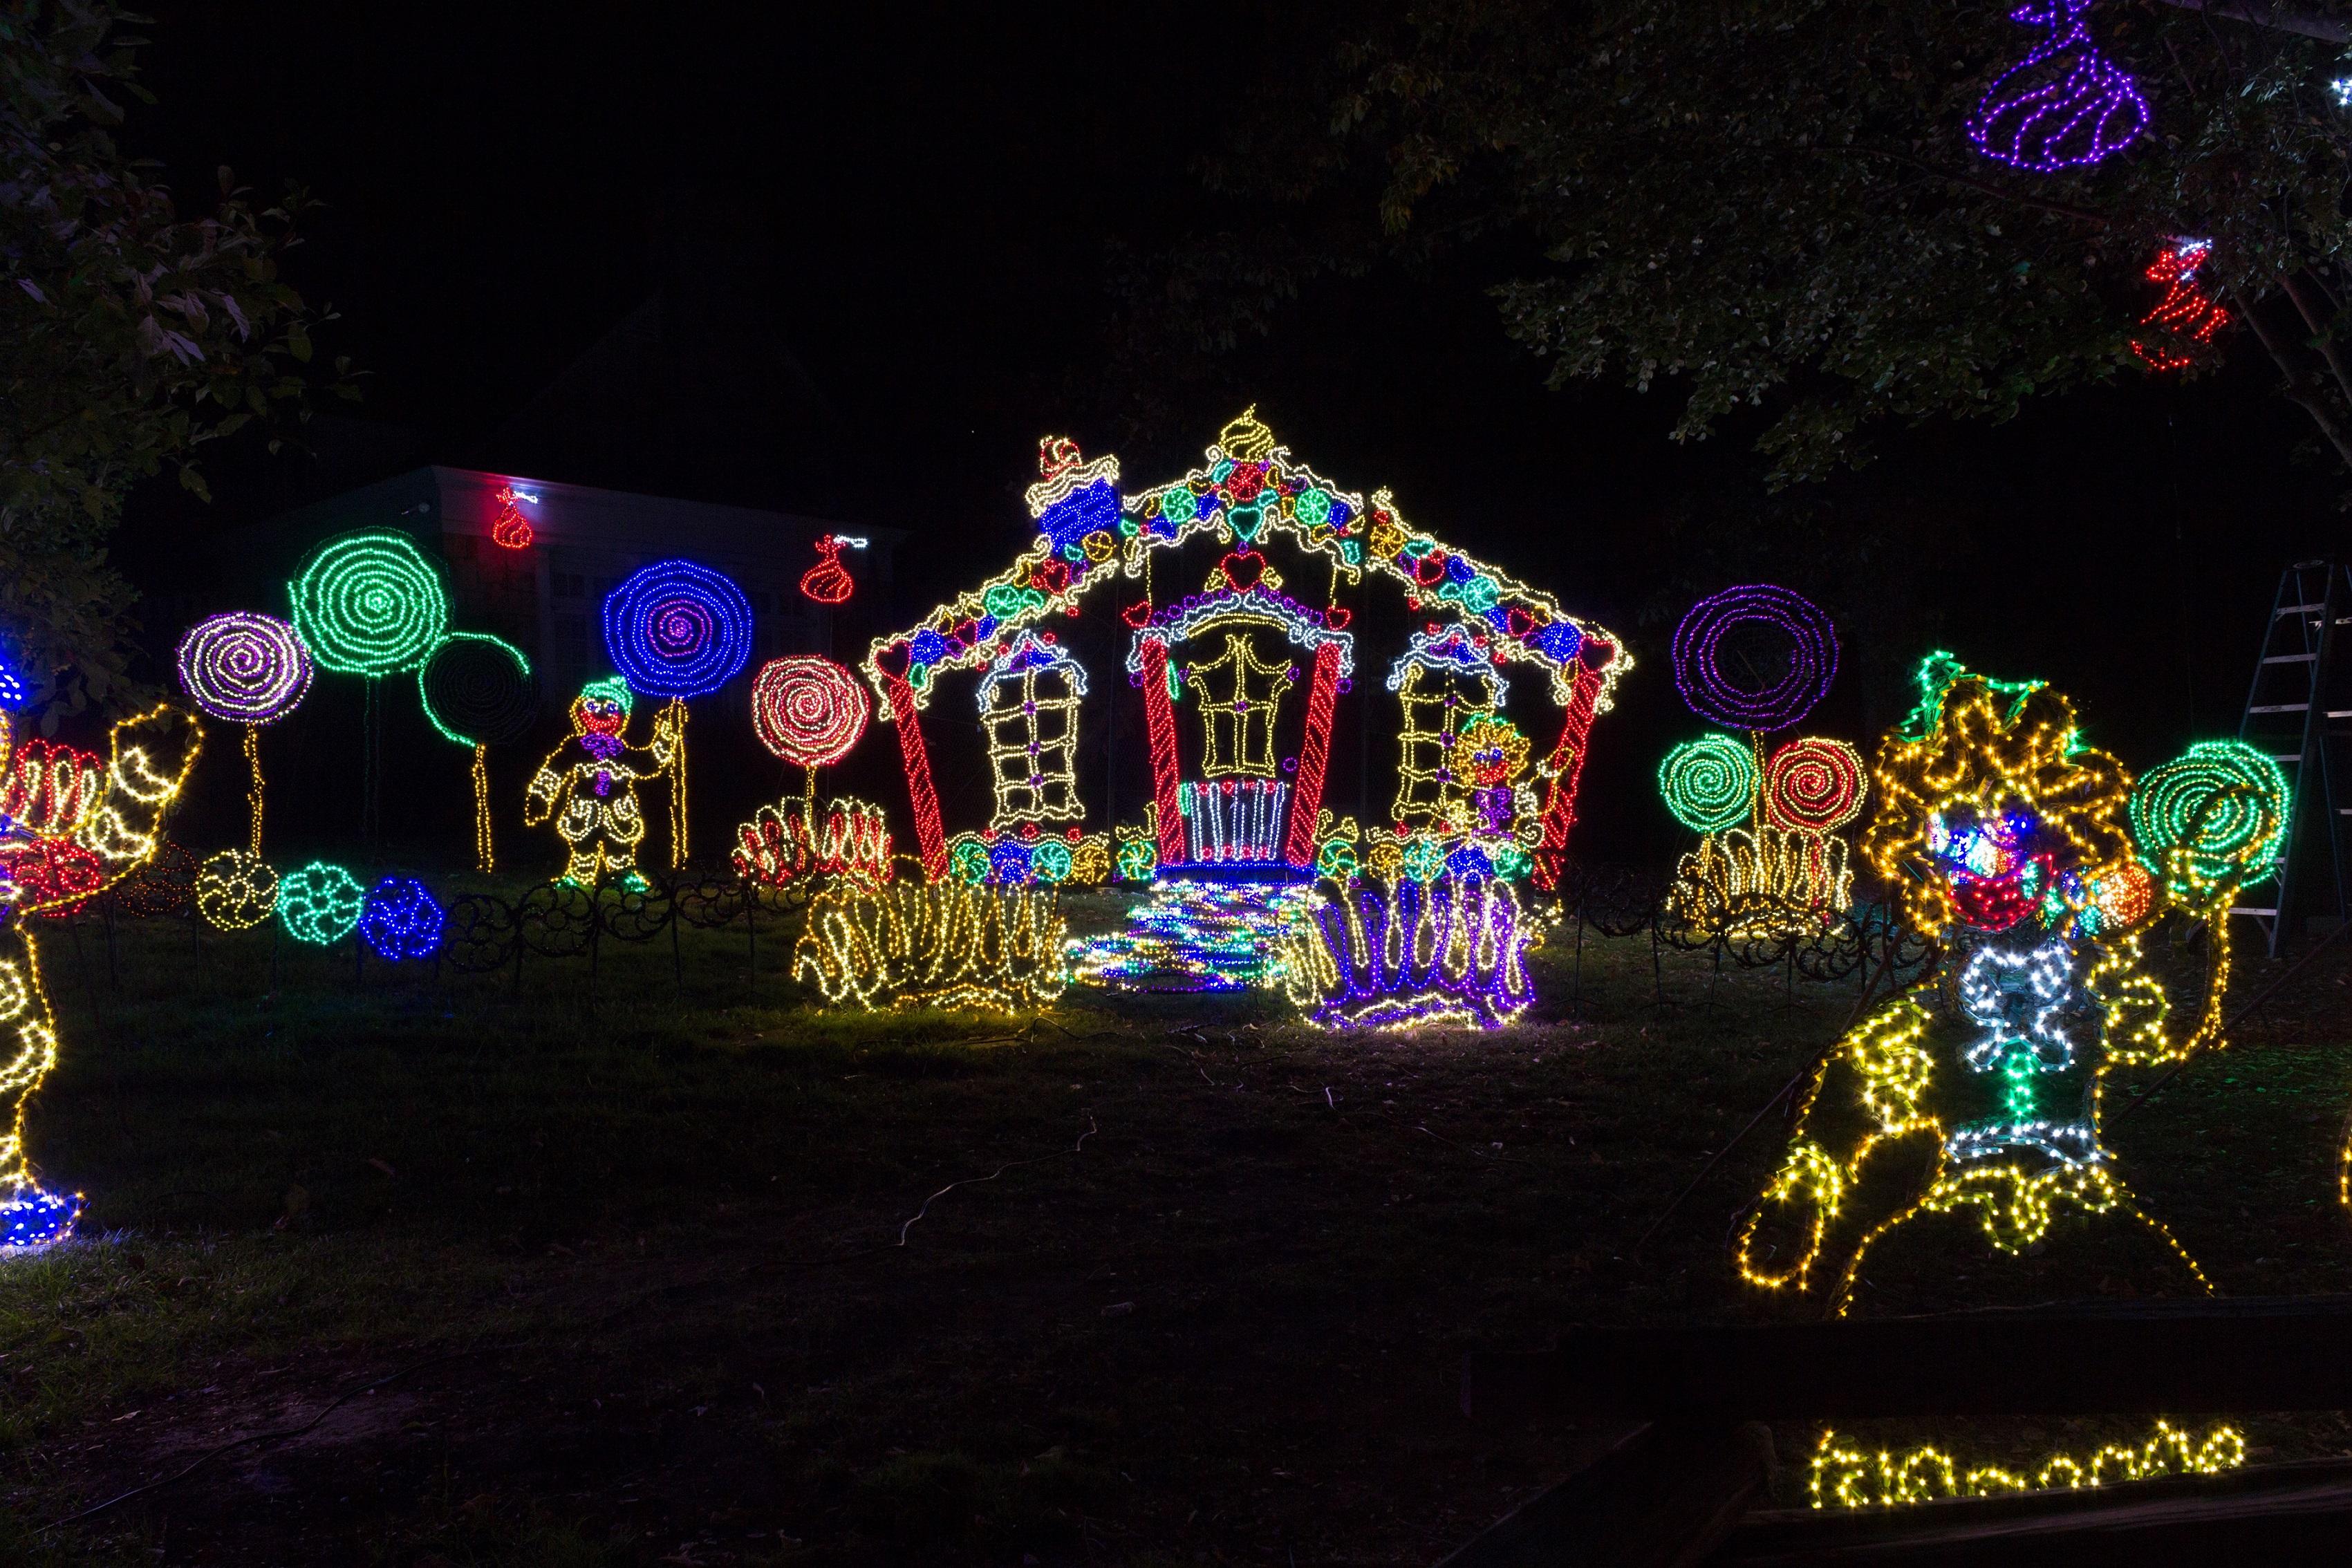 Rock City 39 S Enchanted Garden Of Lights Holiday Memories